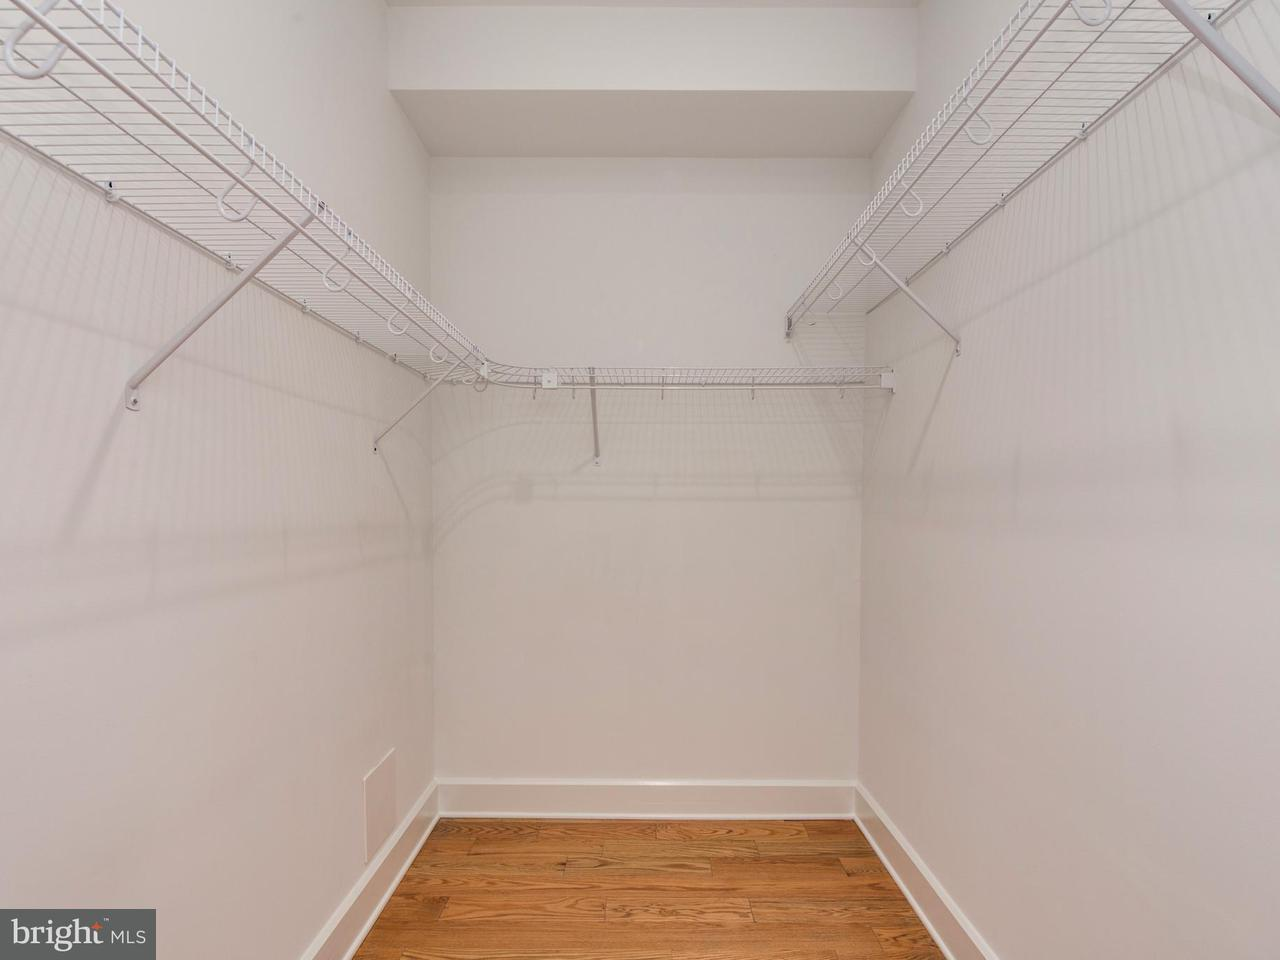 Additional photo for property listing at 1211 10th St Nw #2 1211 10th St Nw #2 Washington, Περιφερεια Τησ Κολουμπια 20001 Ηνωμενεσ Πολιτειεσ